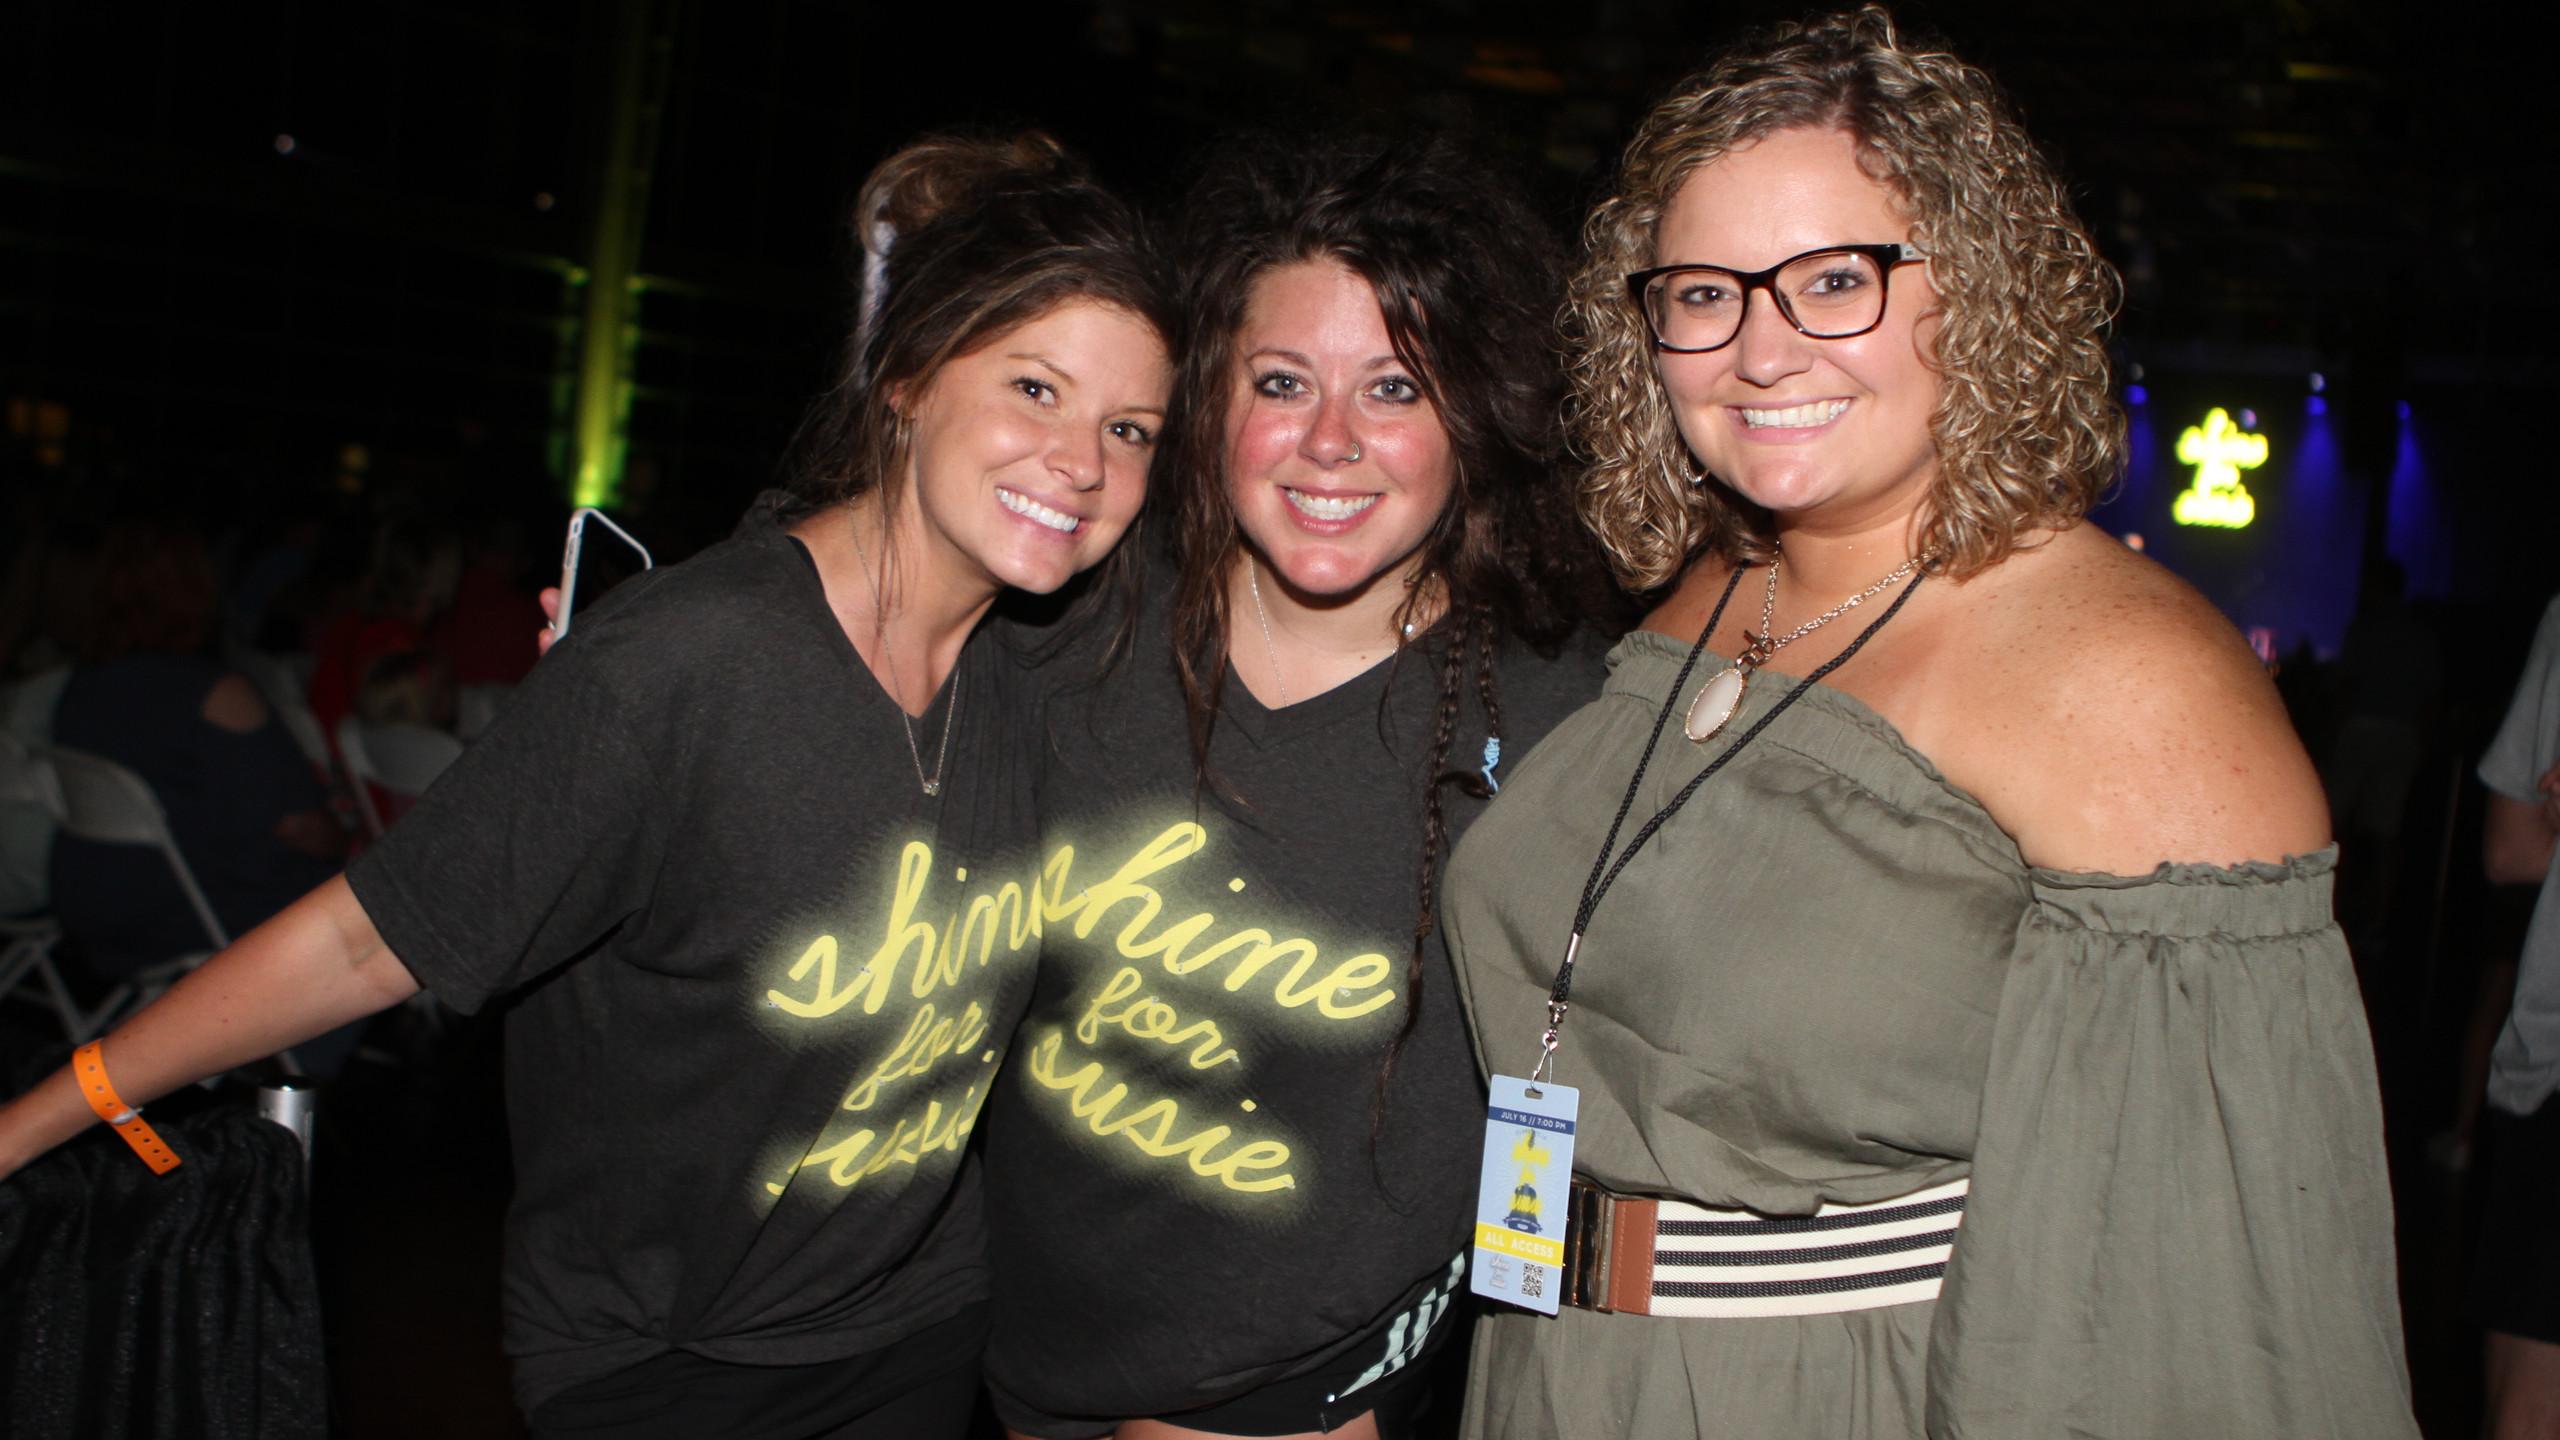 Jenna & Rebekah Liles, Sally Burchett